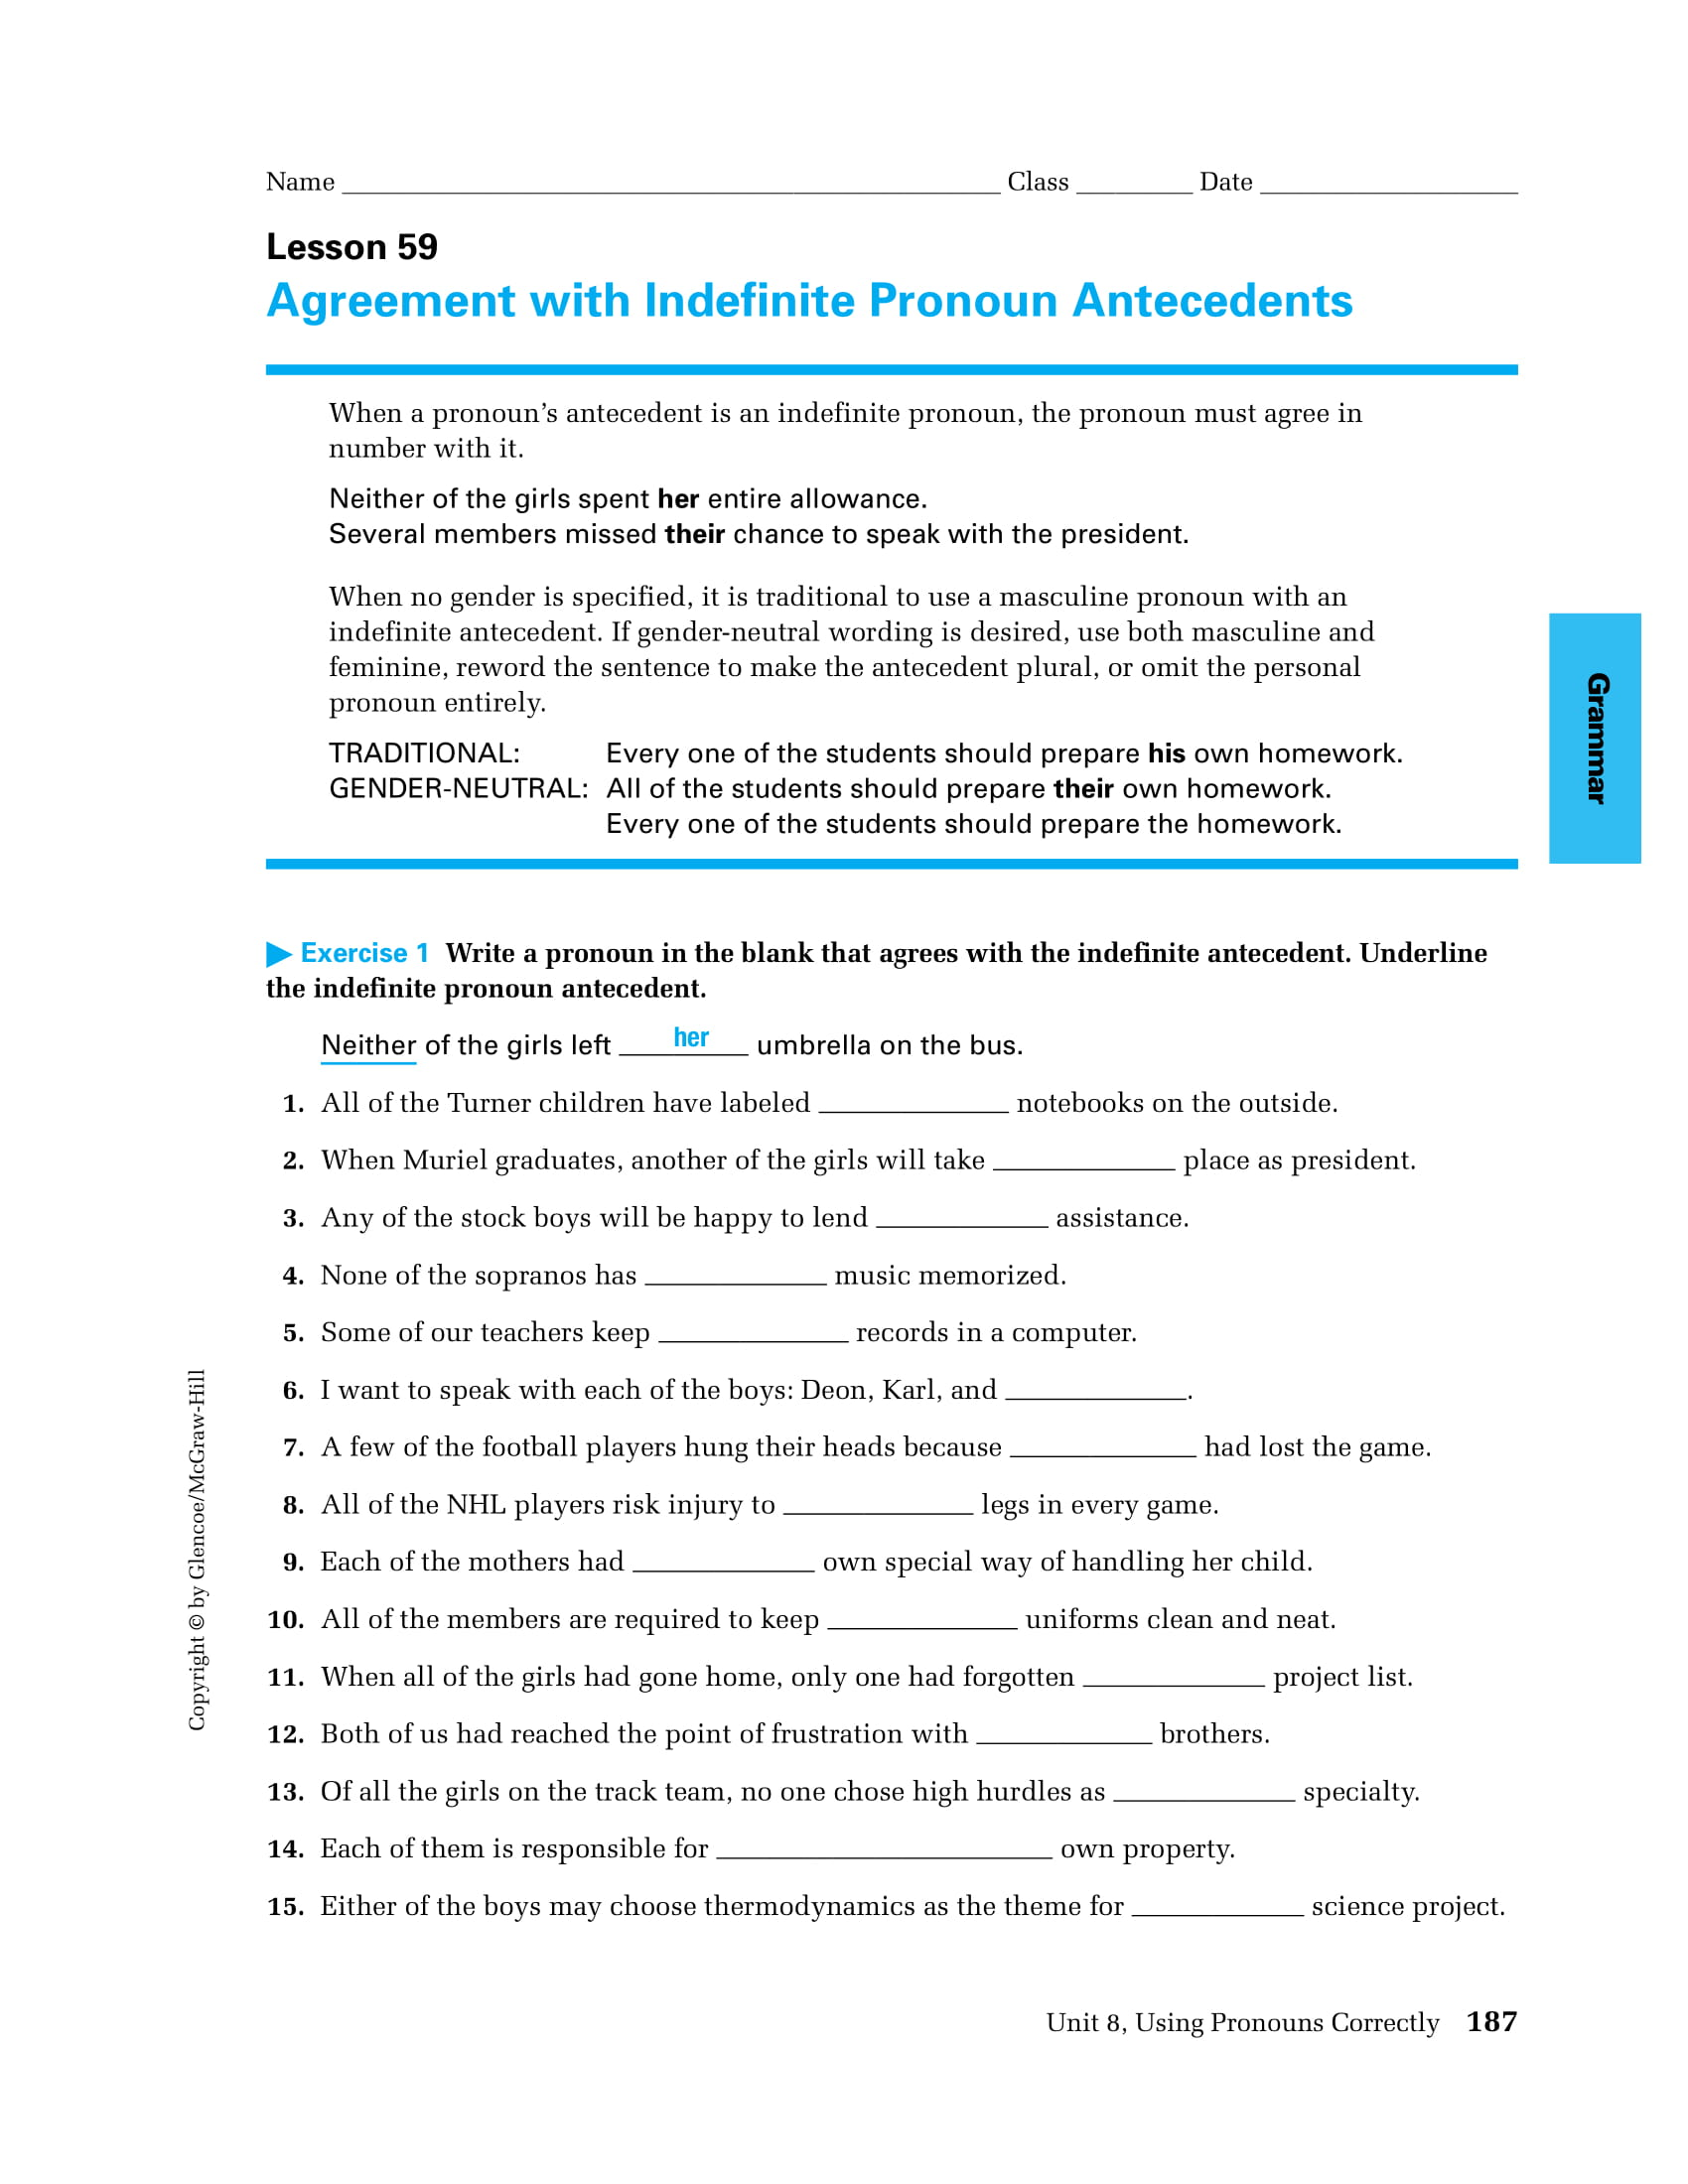 how to teach pronoun antecedent agreement